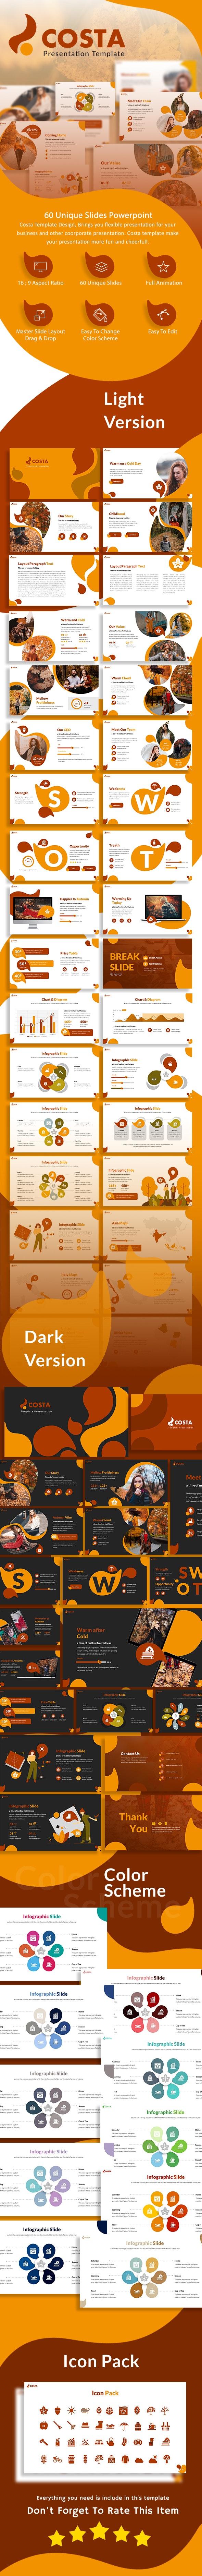 Costa Autumn Season Presentation Template - Creative PowerPoint Templates